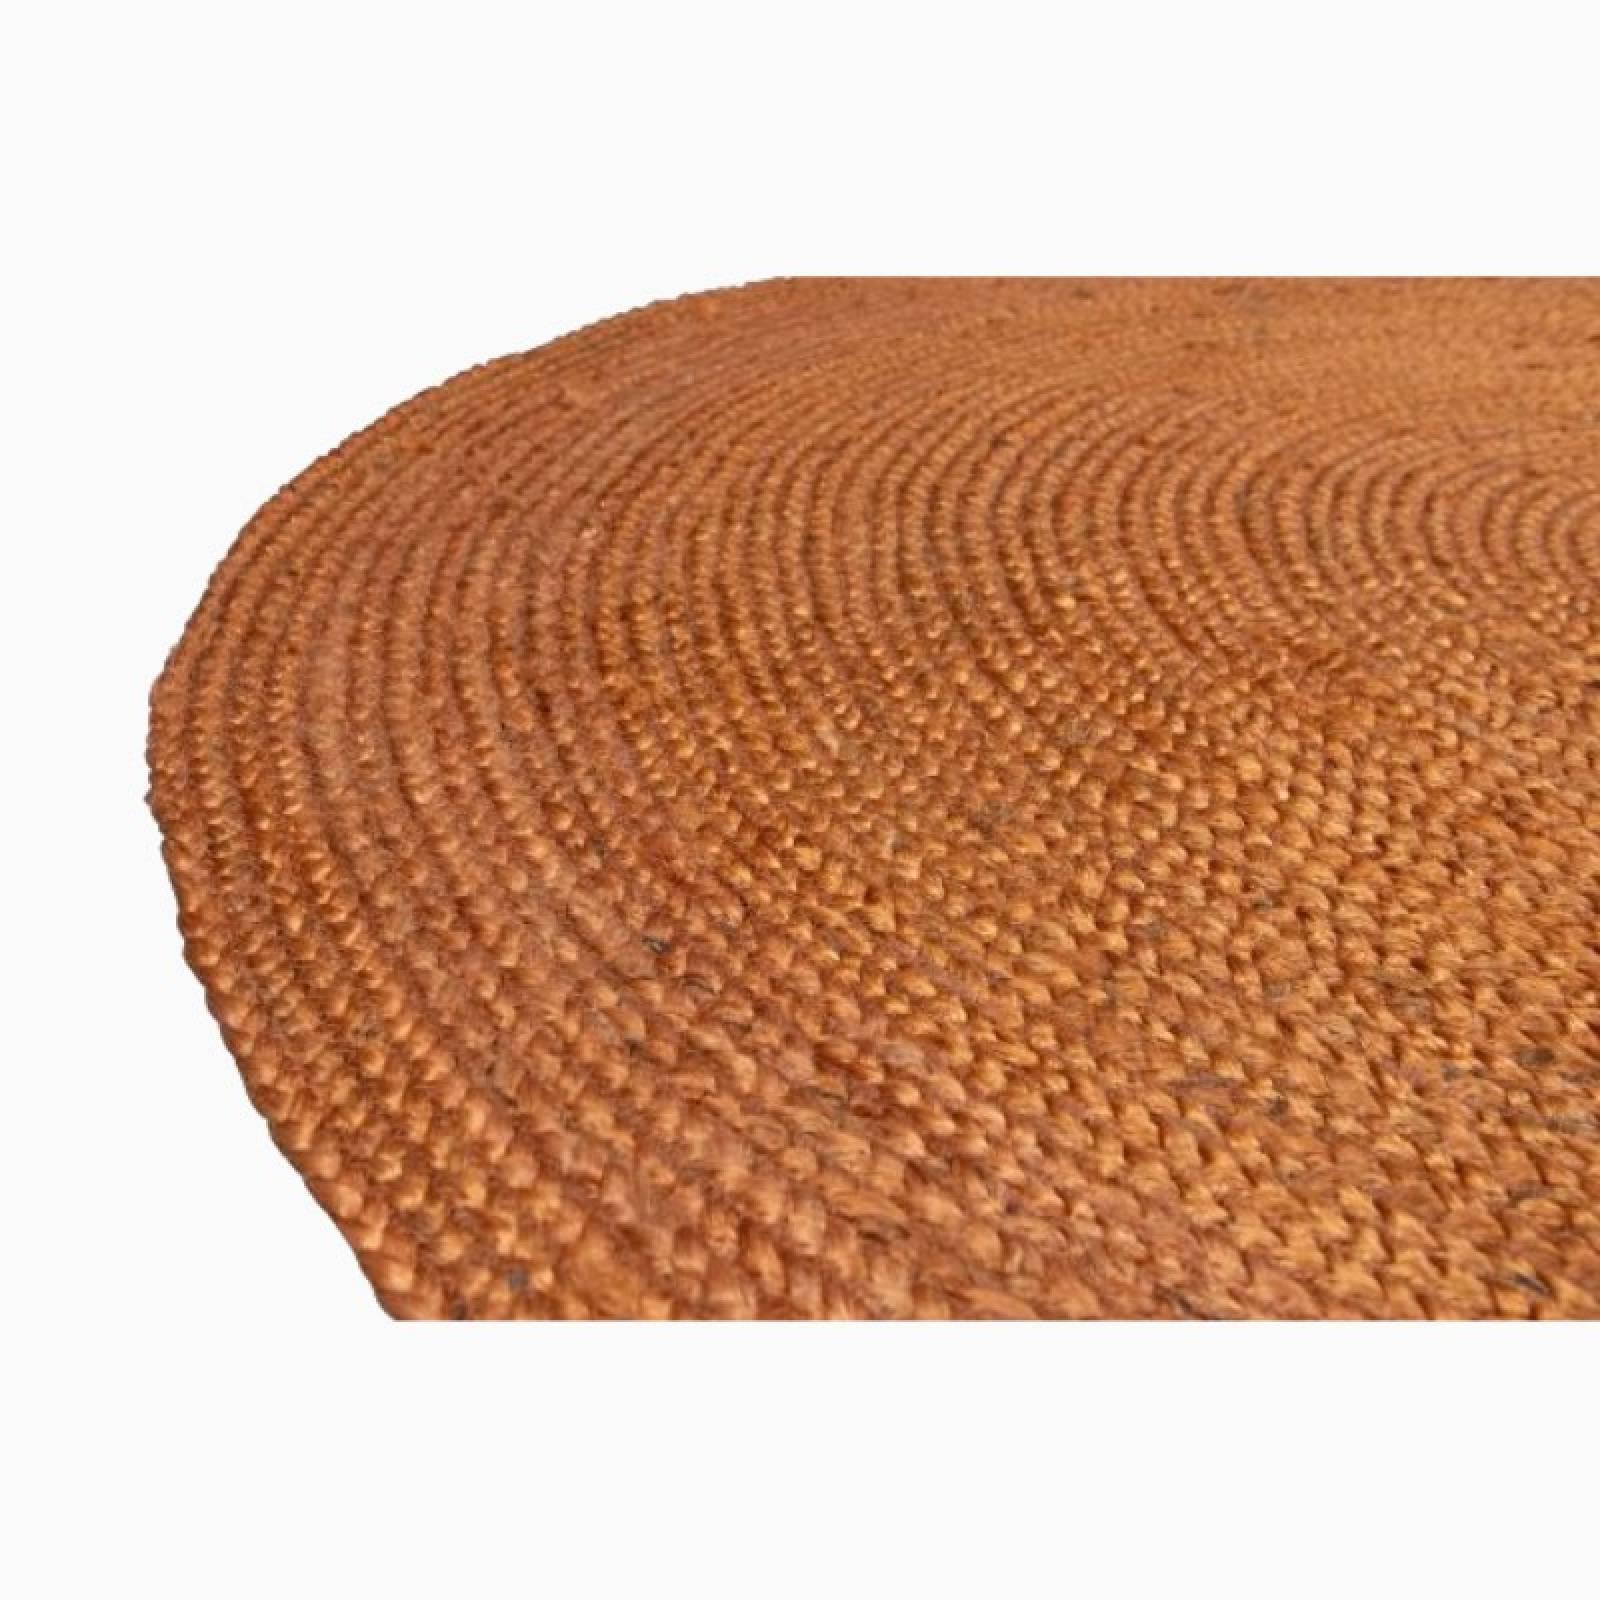 Large Circular Jute Rug In Orange D:150cm thumbnails